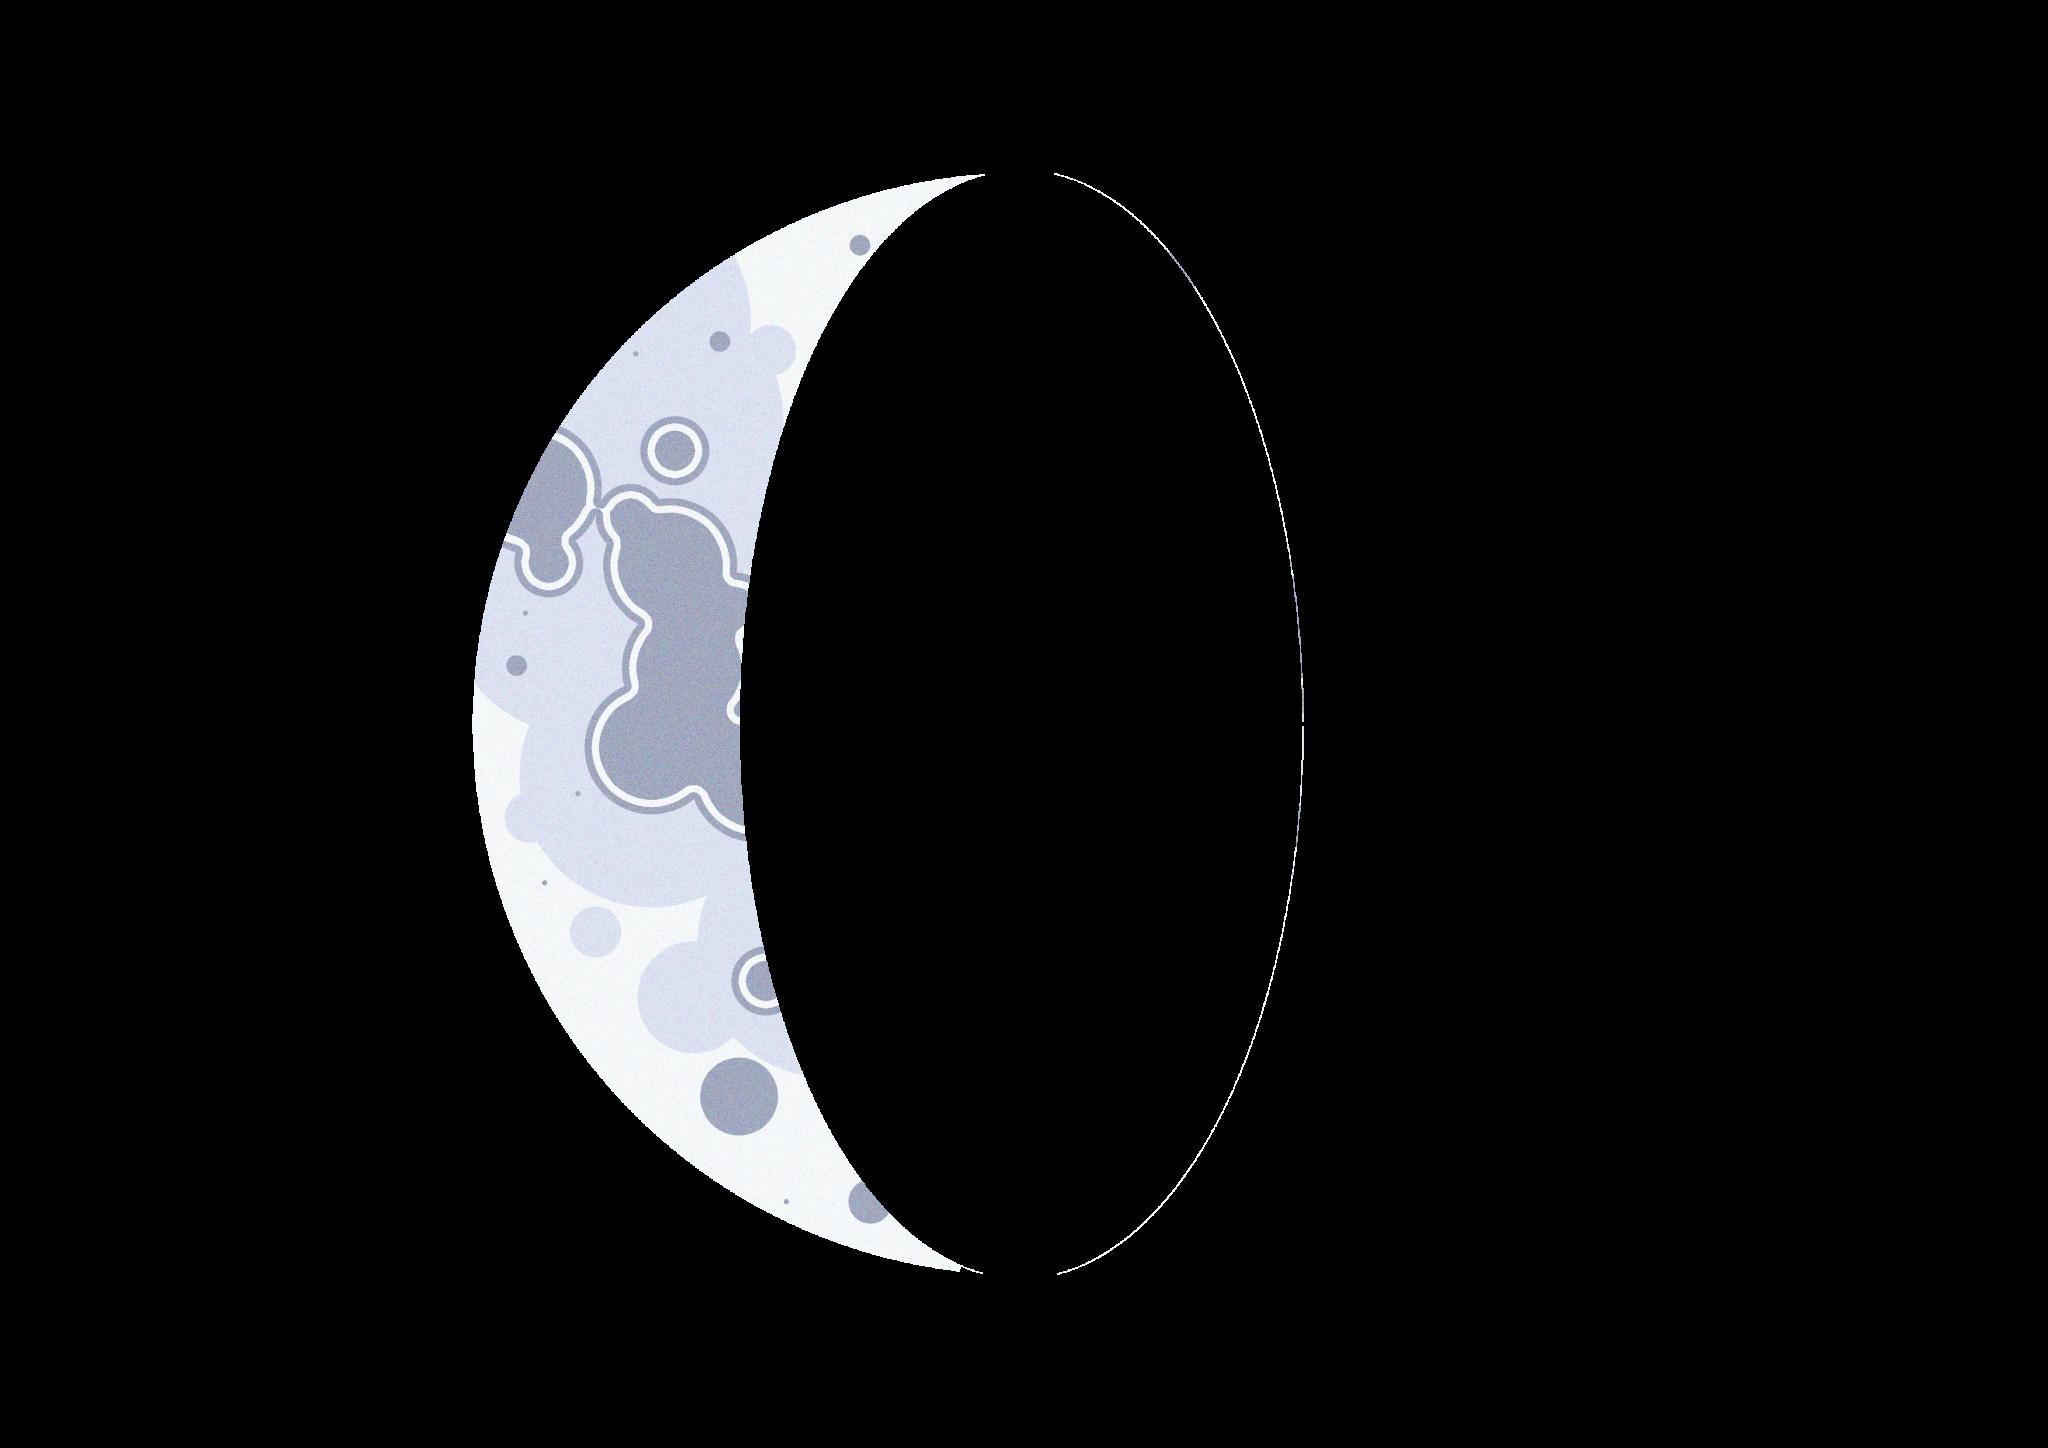 Cresent Moon noise